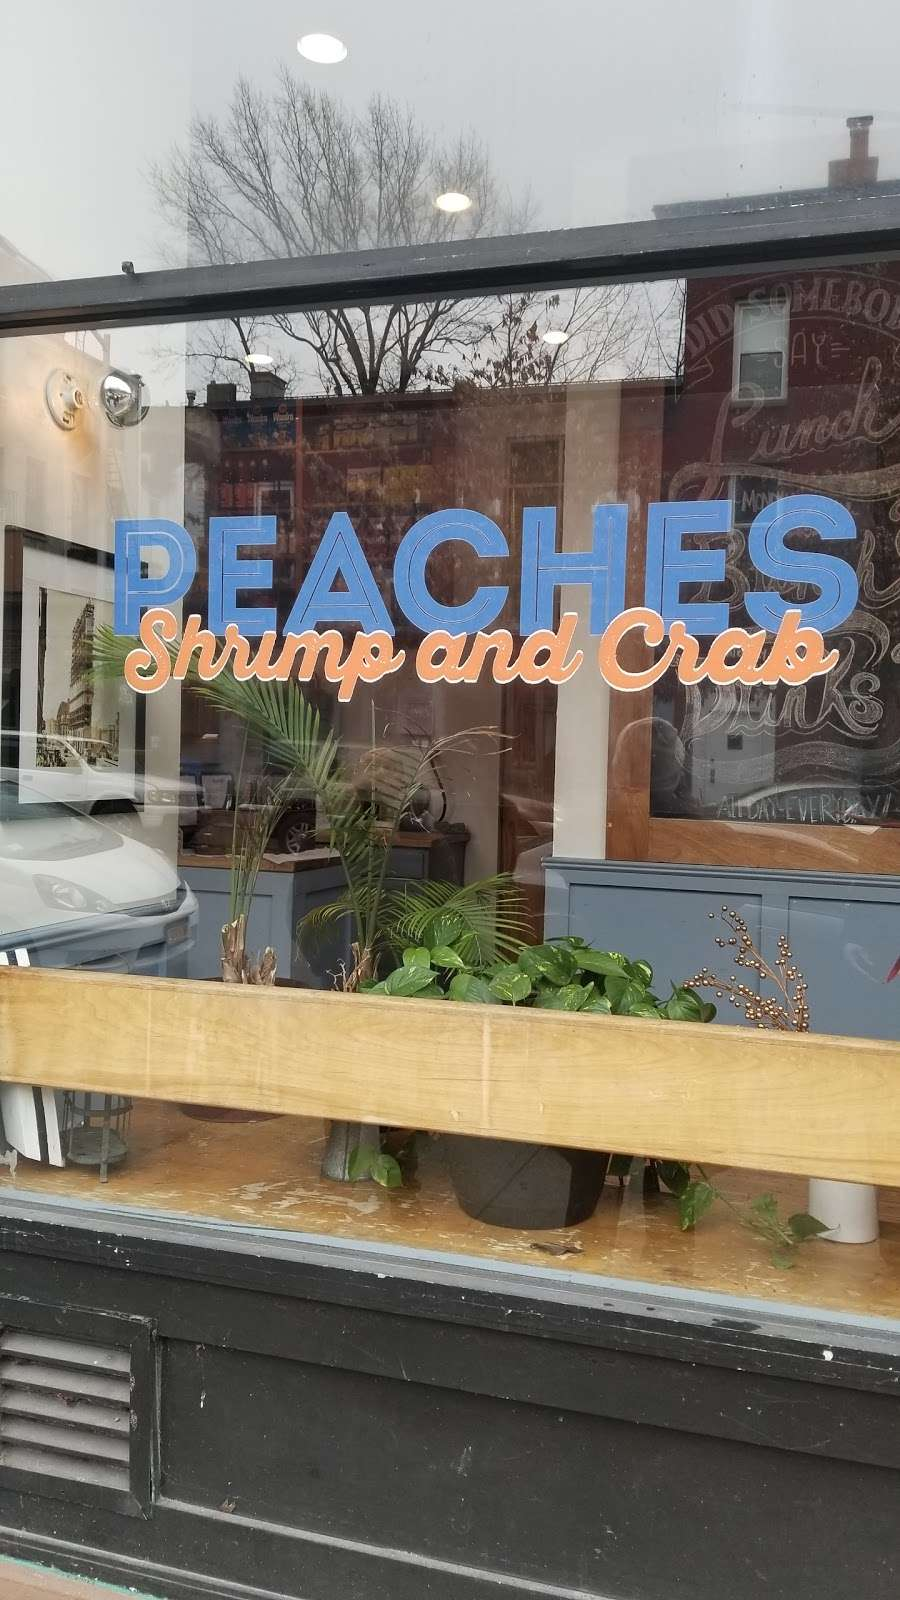 Peaches Shrimp & Crab - restaurant  | Photo 3 of 10 | Address: 285 Grand Ave, Brooklyn, NY 11238, USA | Phone: (718) 638-9500